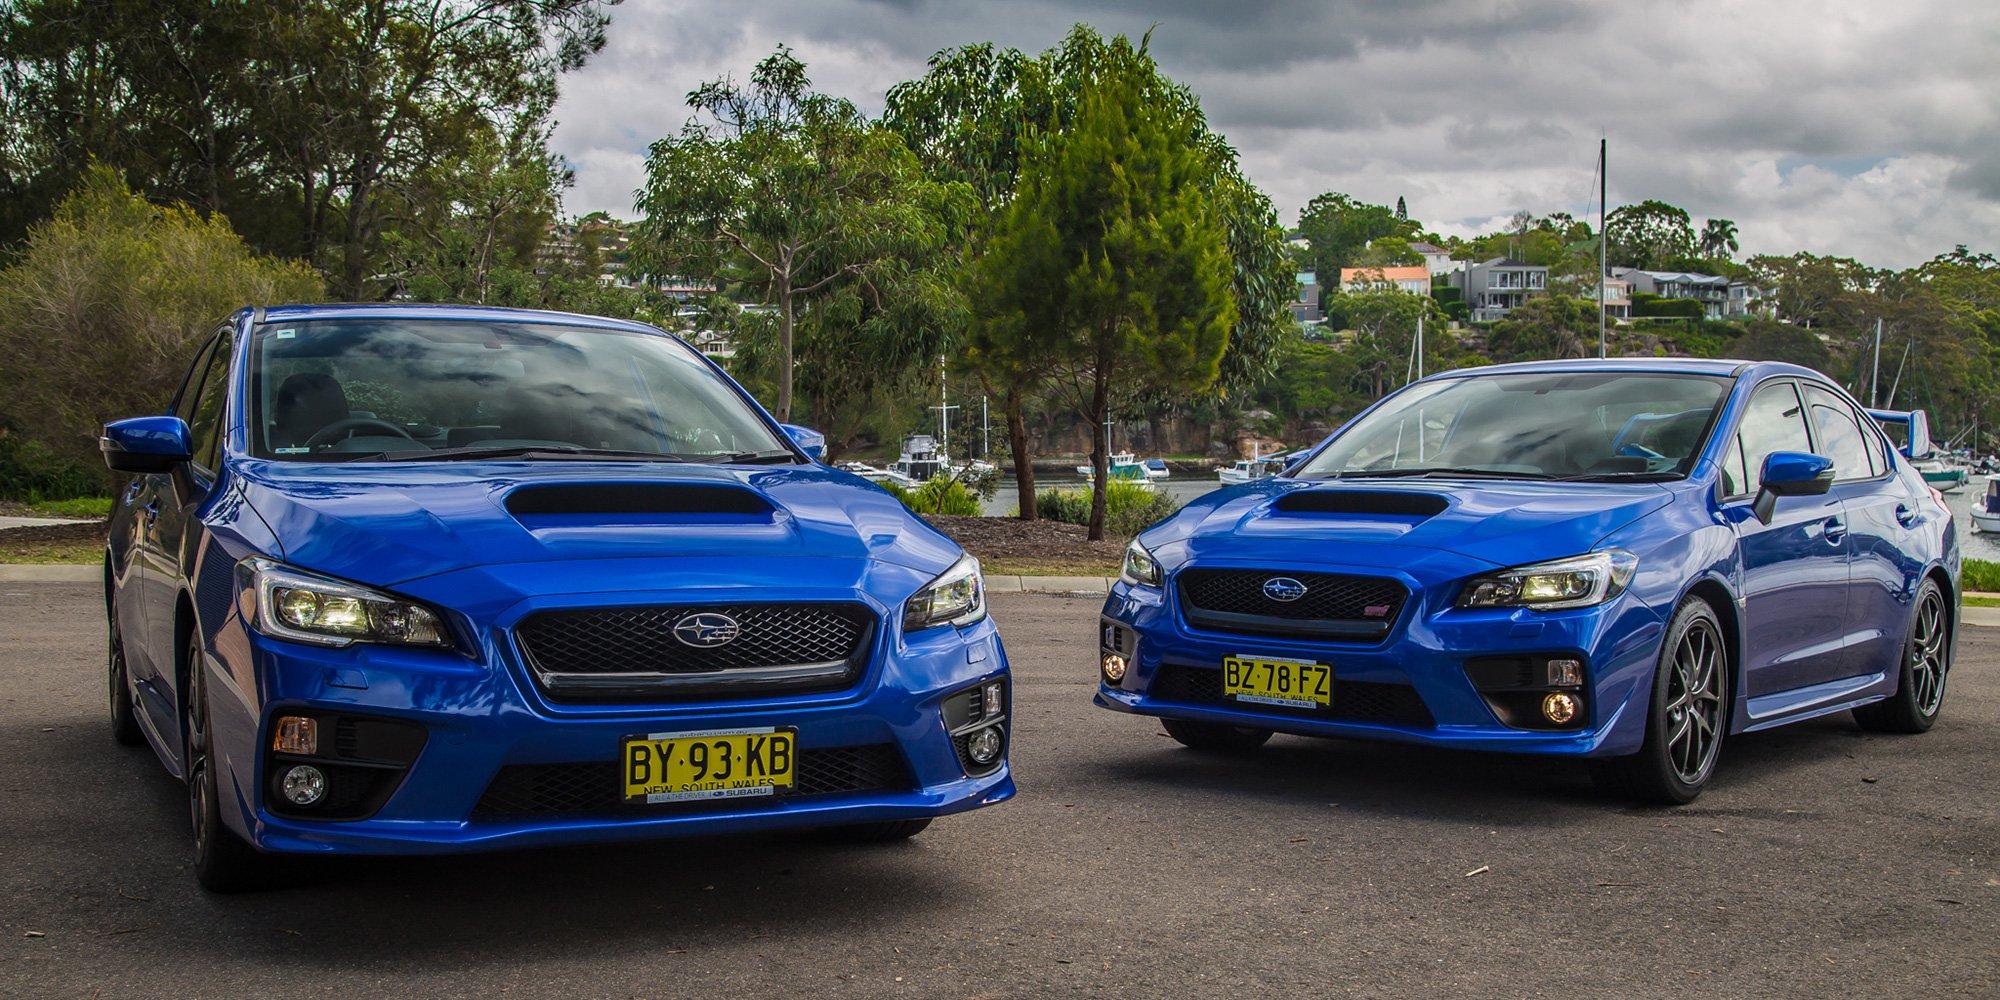 Difference Between Wrx And Sti >> Subaru Wrx V Subaru Wrx Sti Comparison Review Caradvice